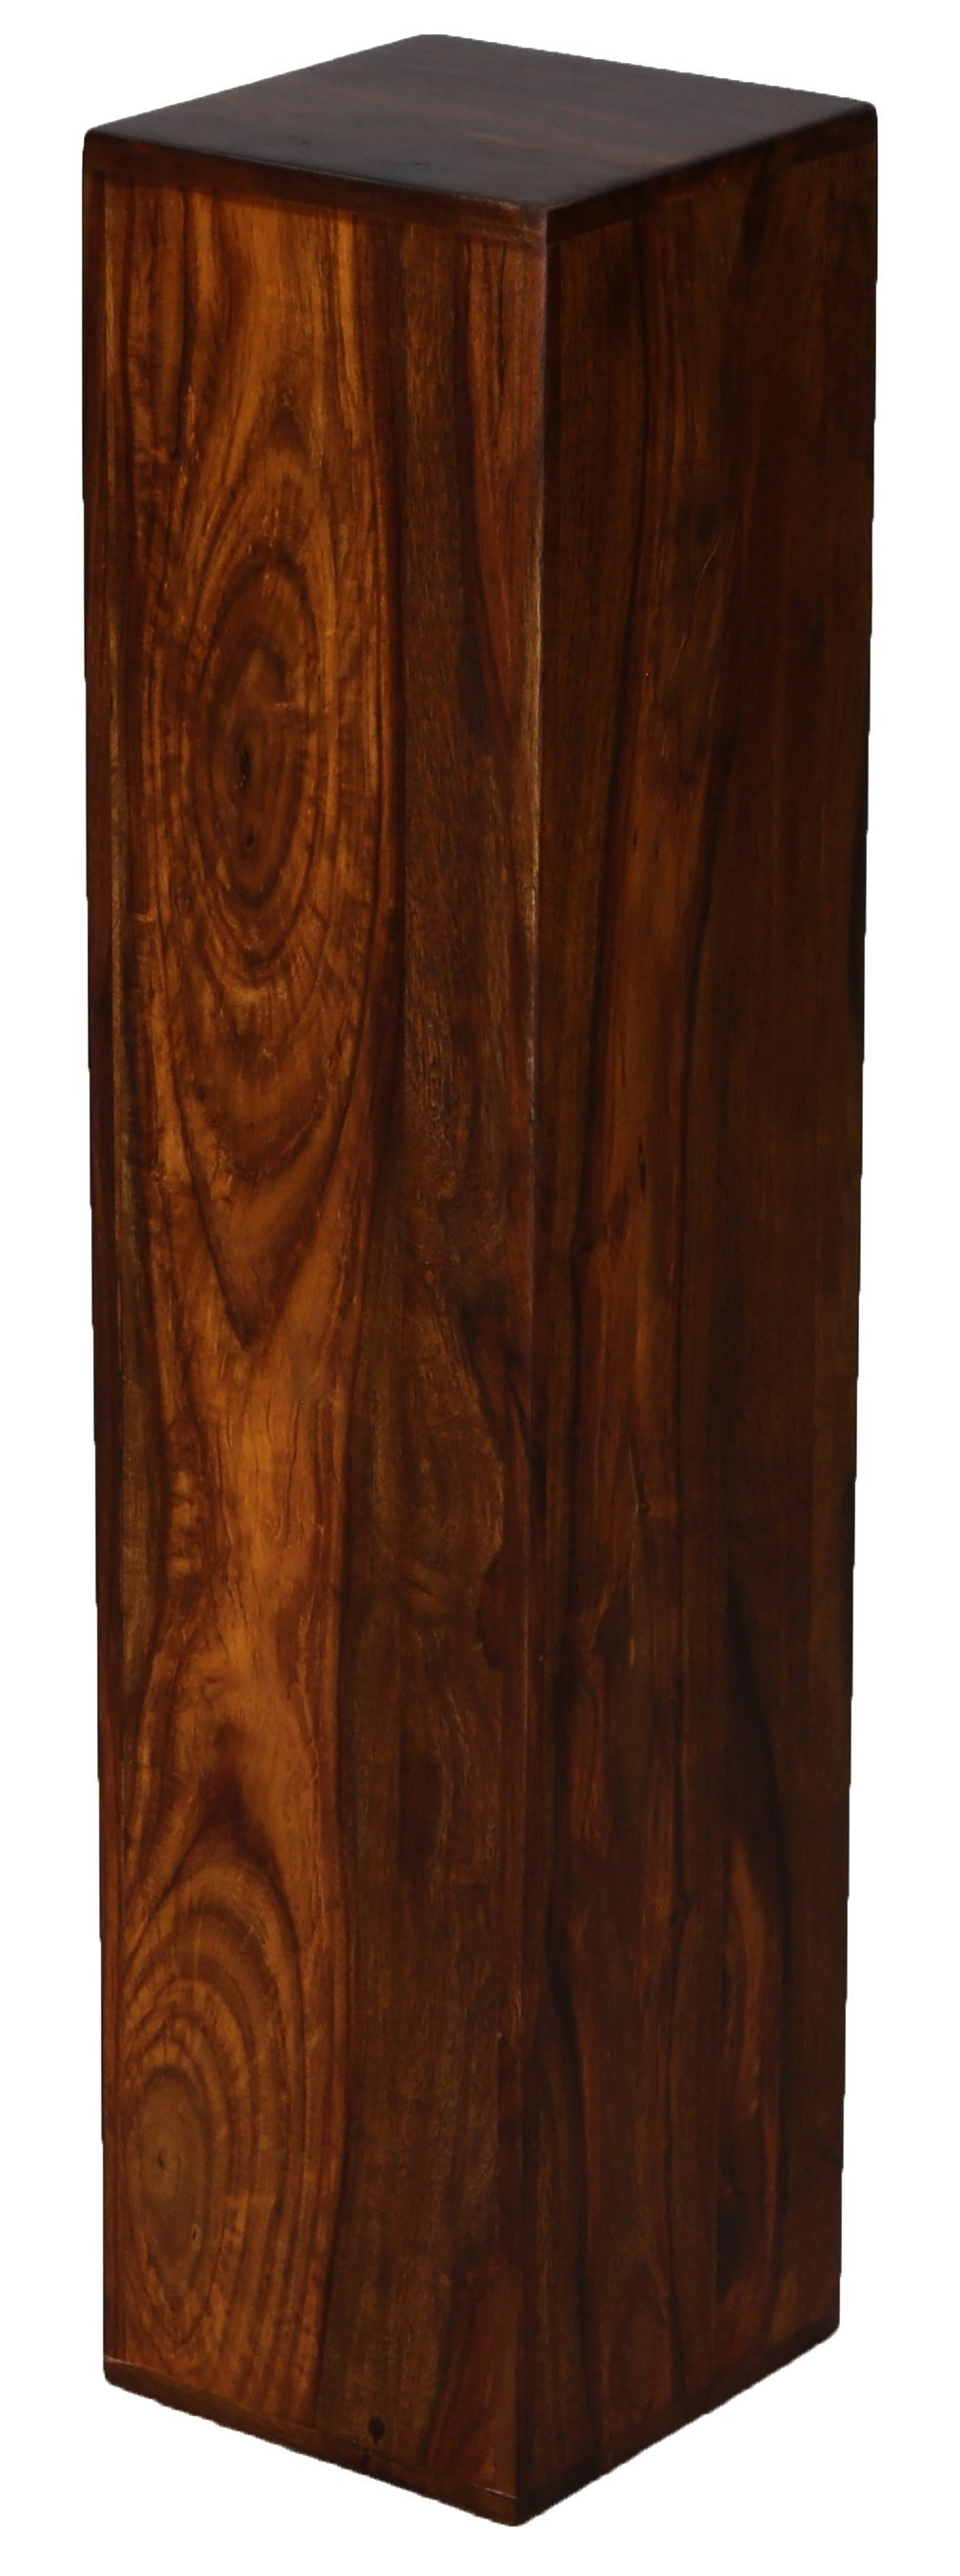 "Lampen- Blumensäule GAN-412 ""Indische Massiv- Holz- Möbel"""